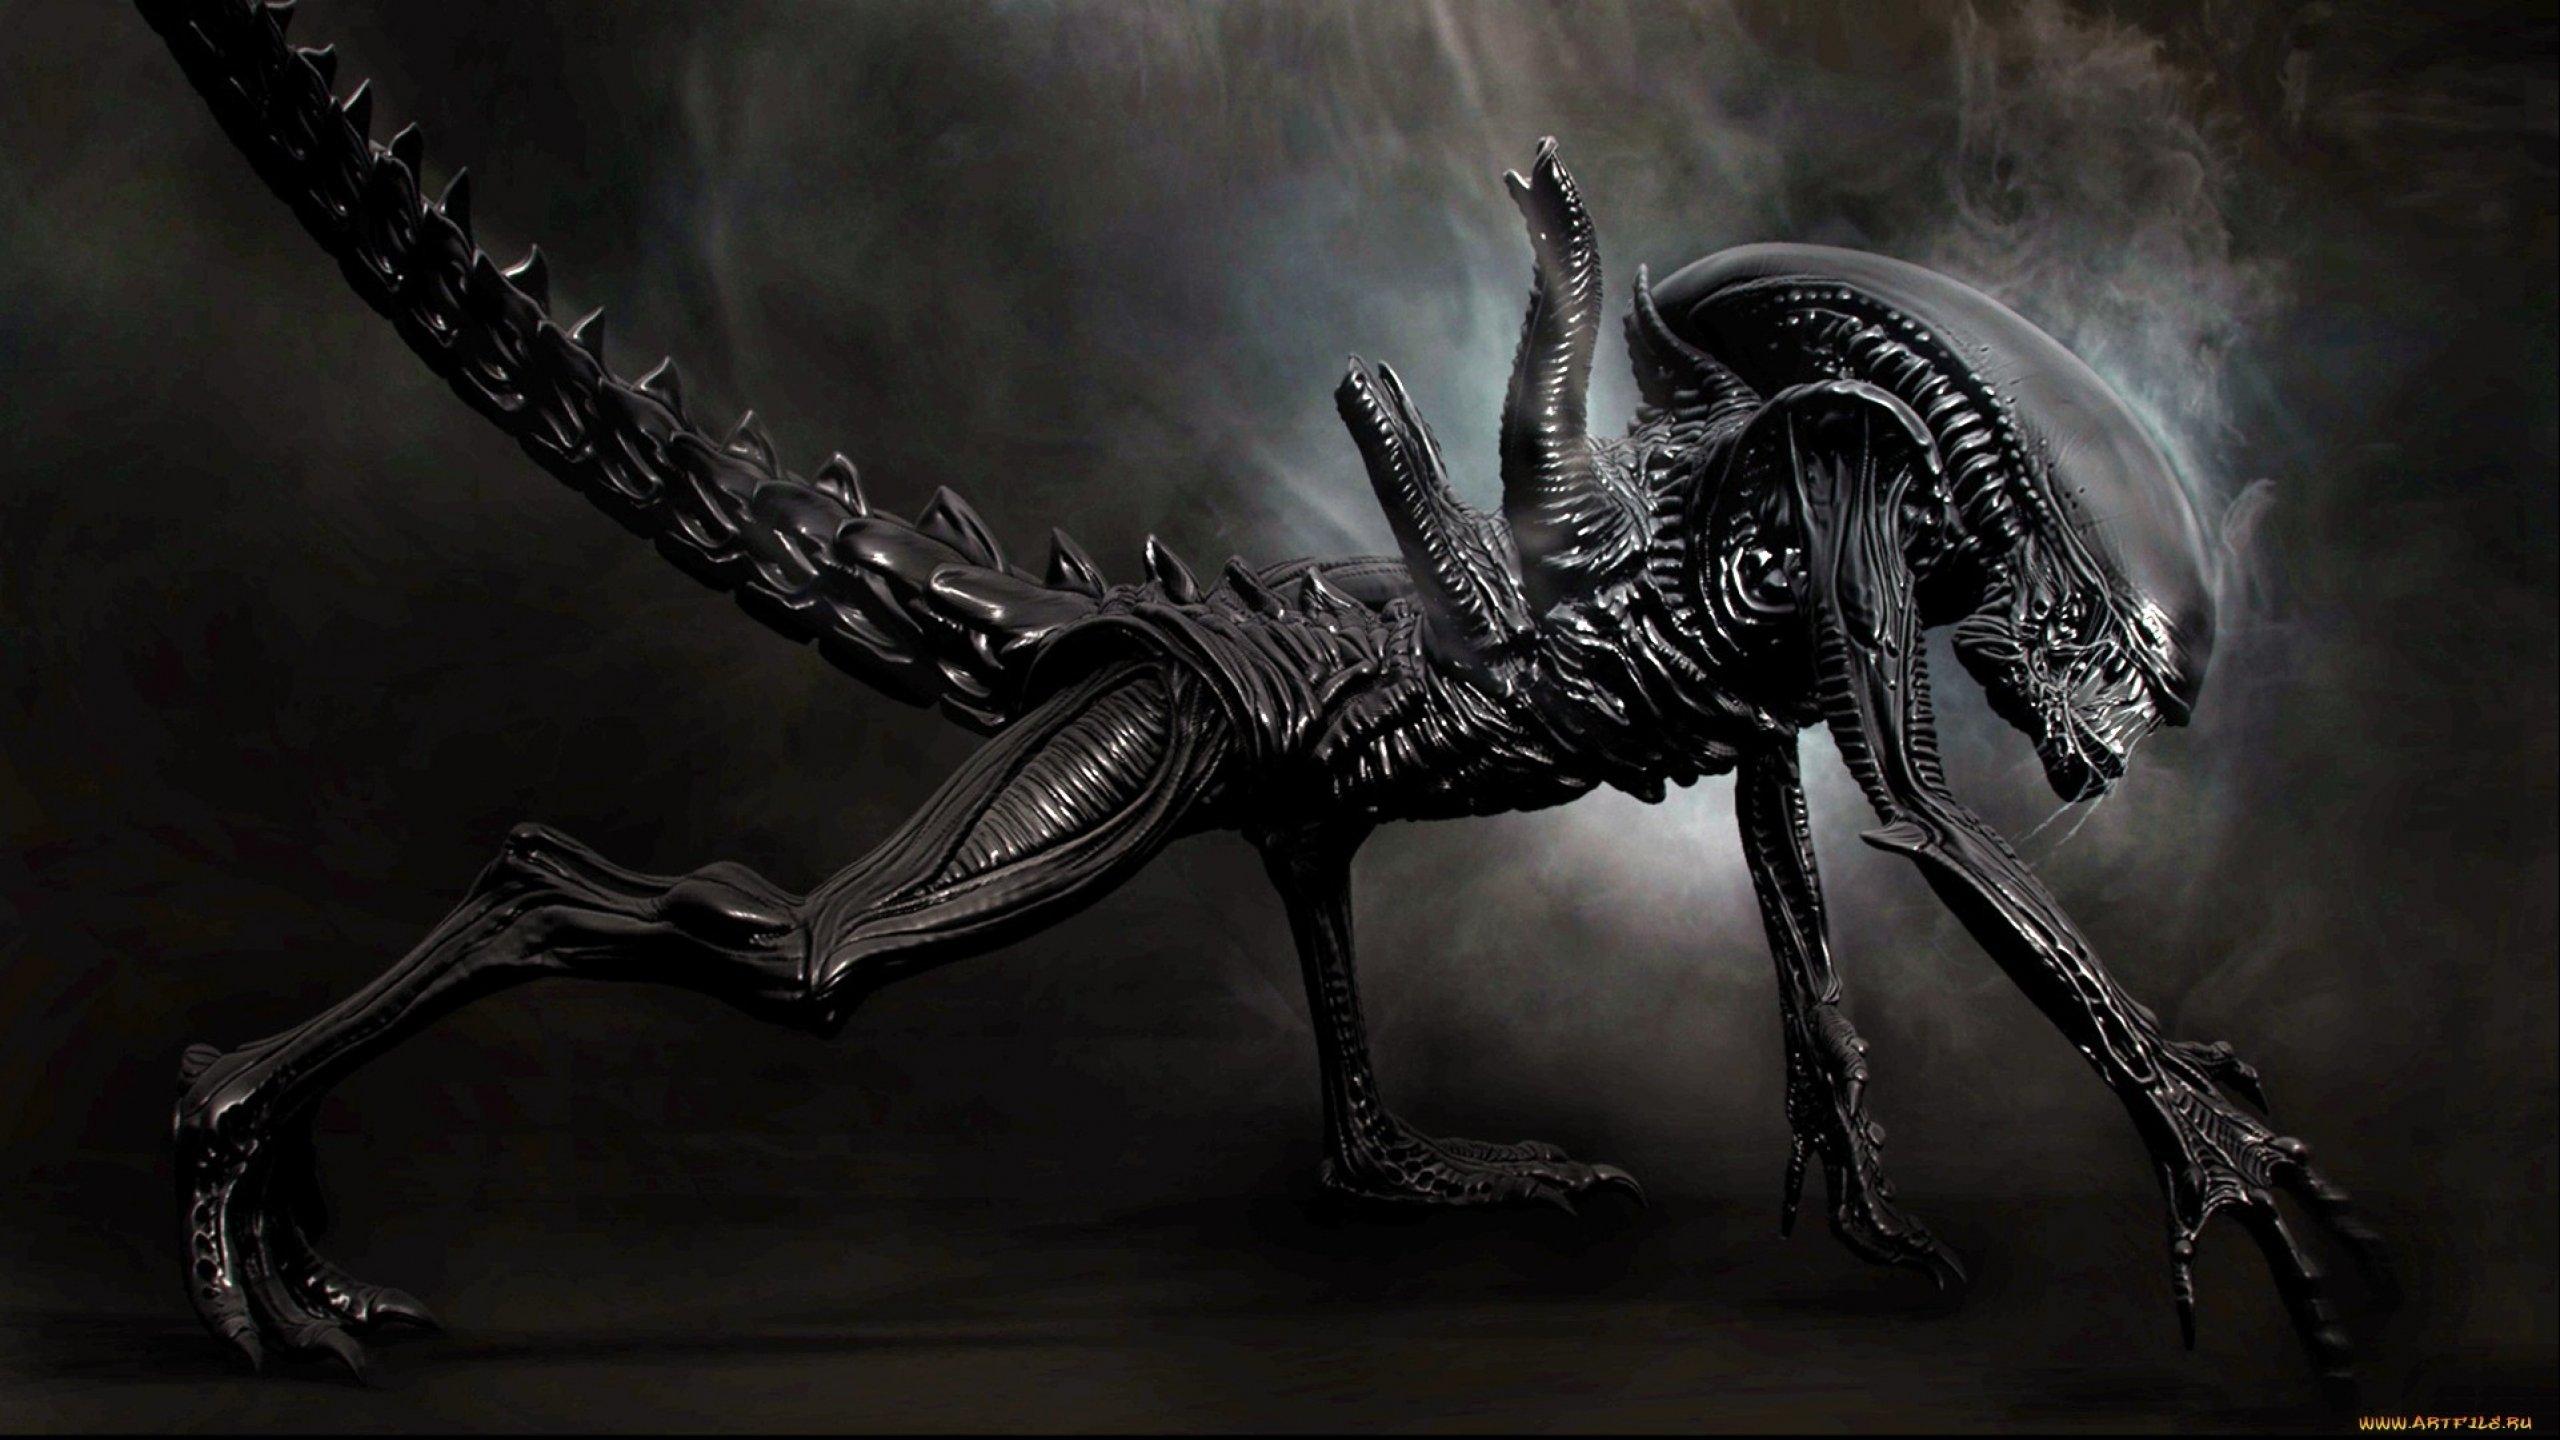 Sci Fi Wallpaper 2560x1440: Alien Sci-fi Art Artwork Futuristic Aliens Wallpaper